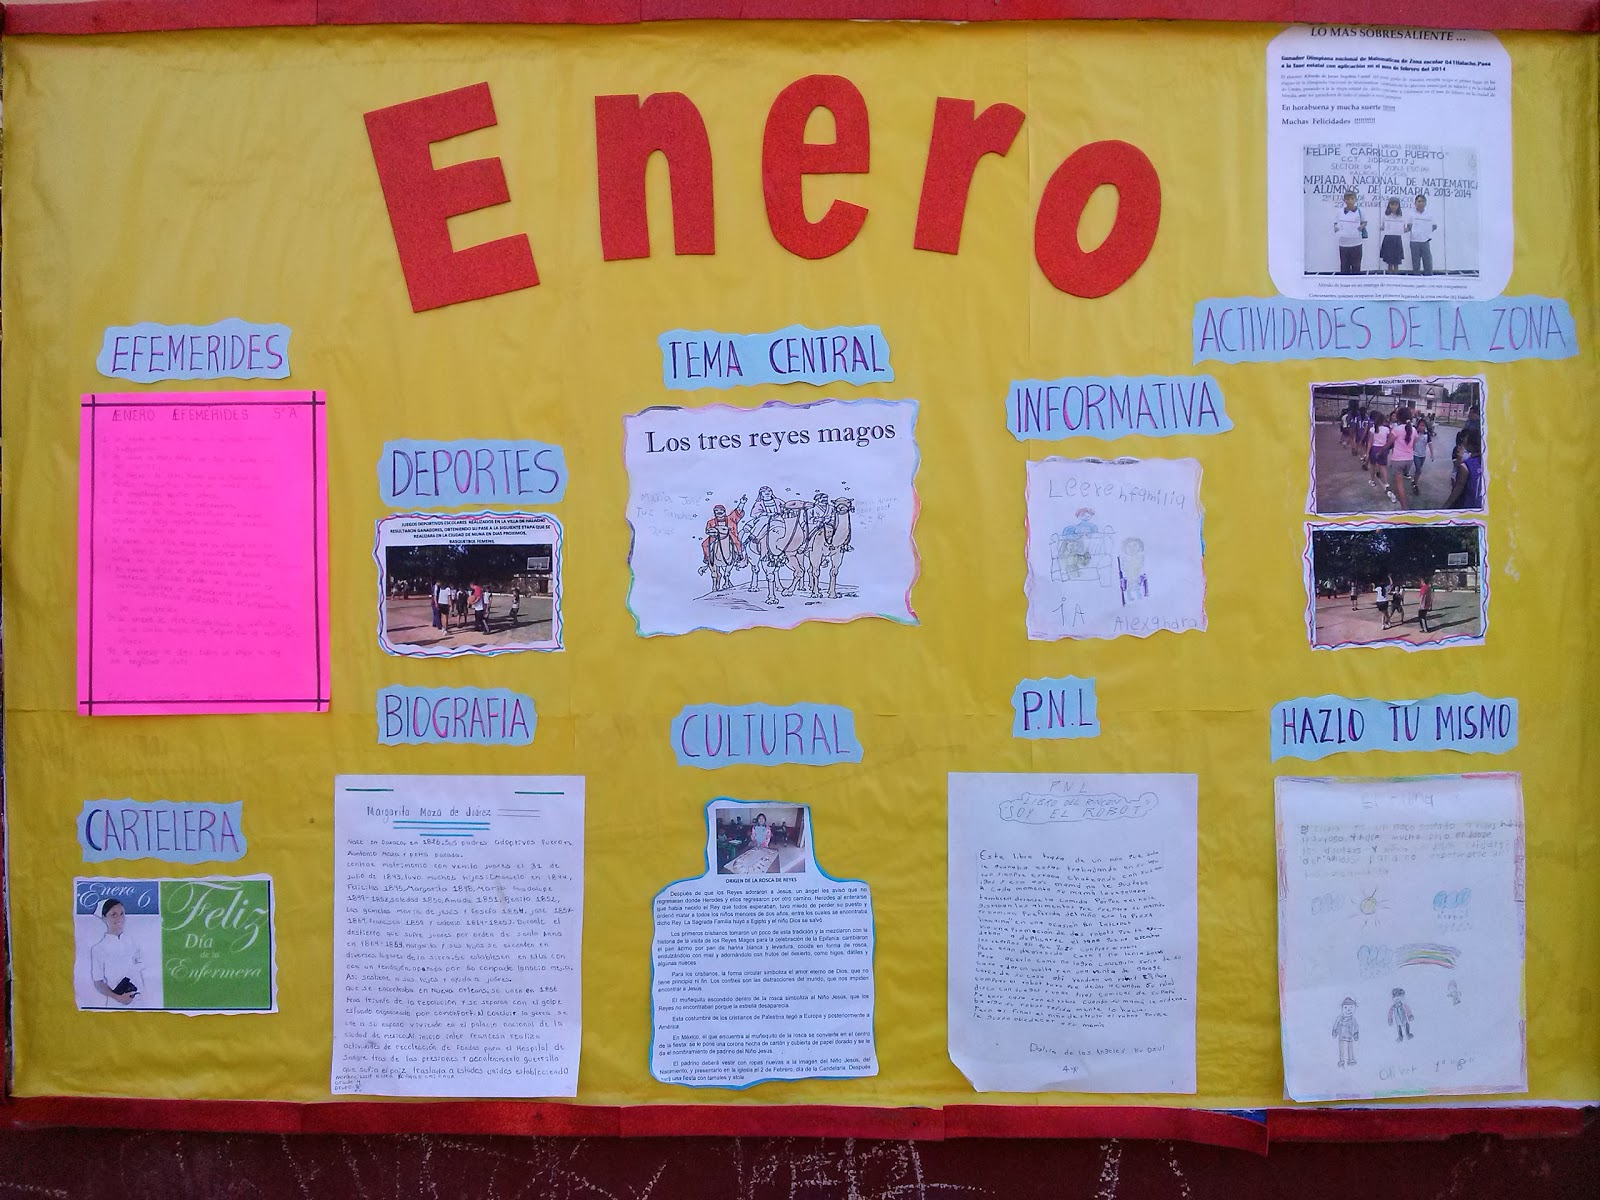 Periodico mura enero 1 imagenes educativas for Amenidades para periodico mural